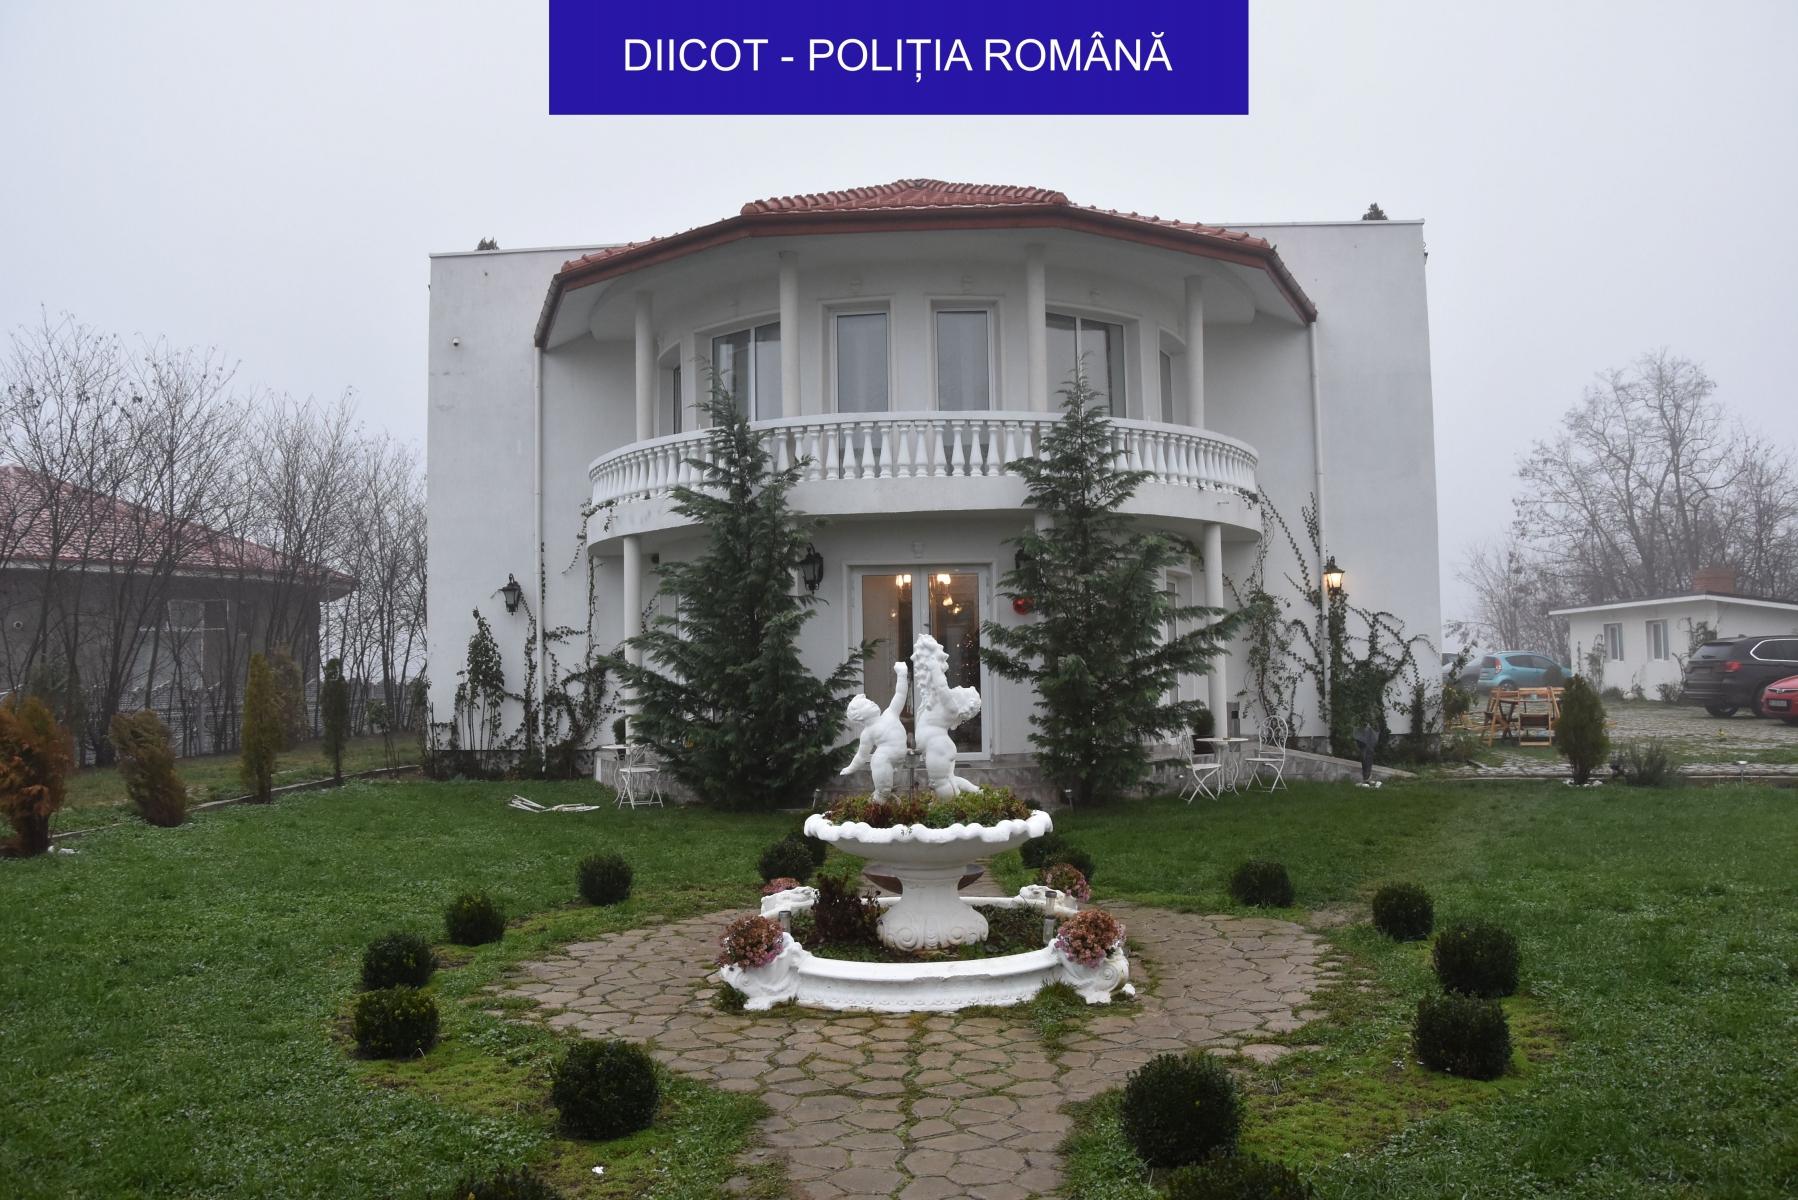 DIICOT (1)